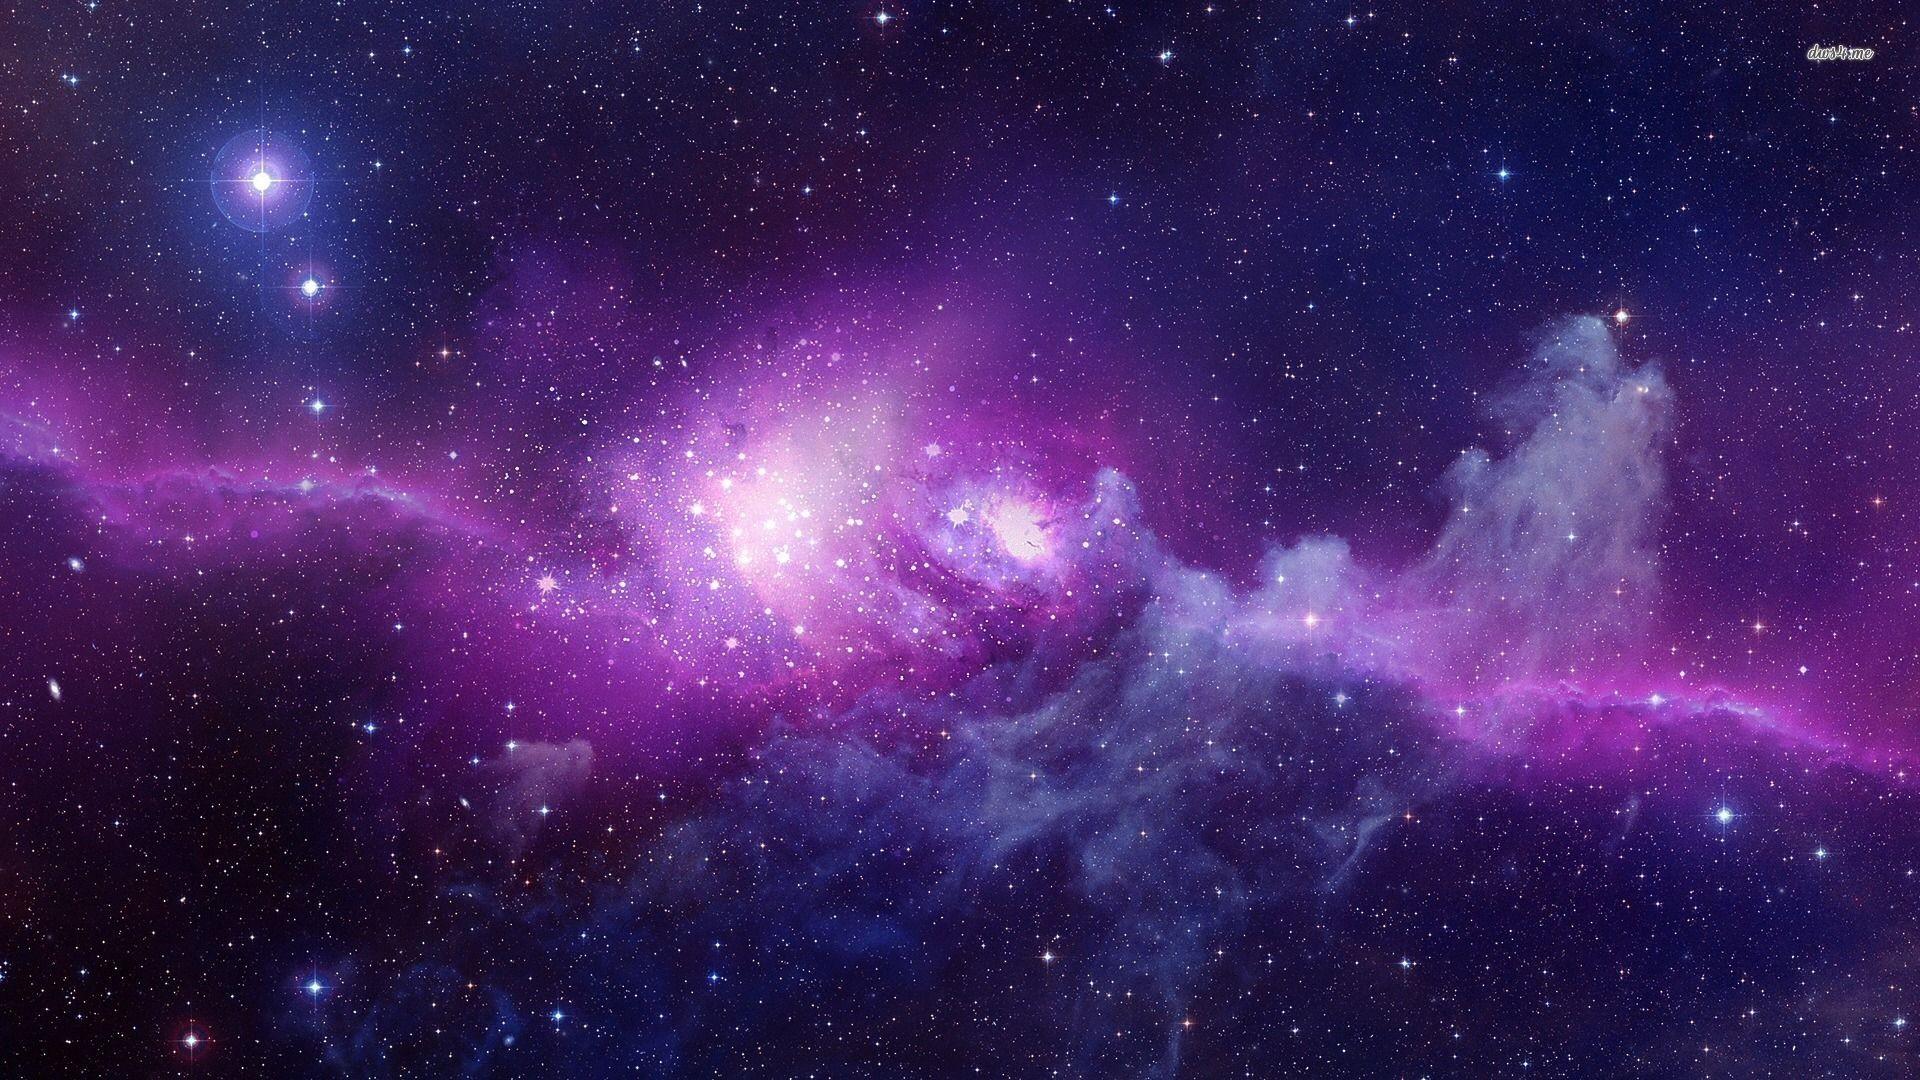 Purple Galaxy Wallpaper 1 Download Free Amazing High Resolution